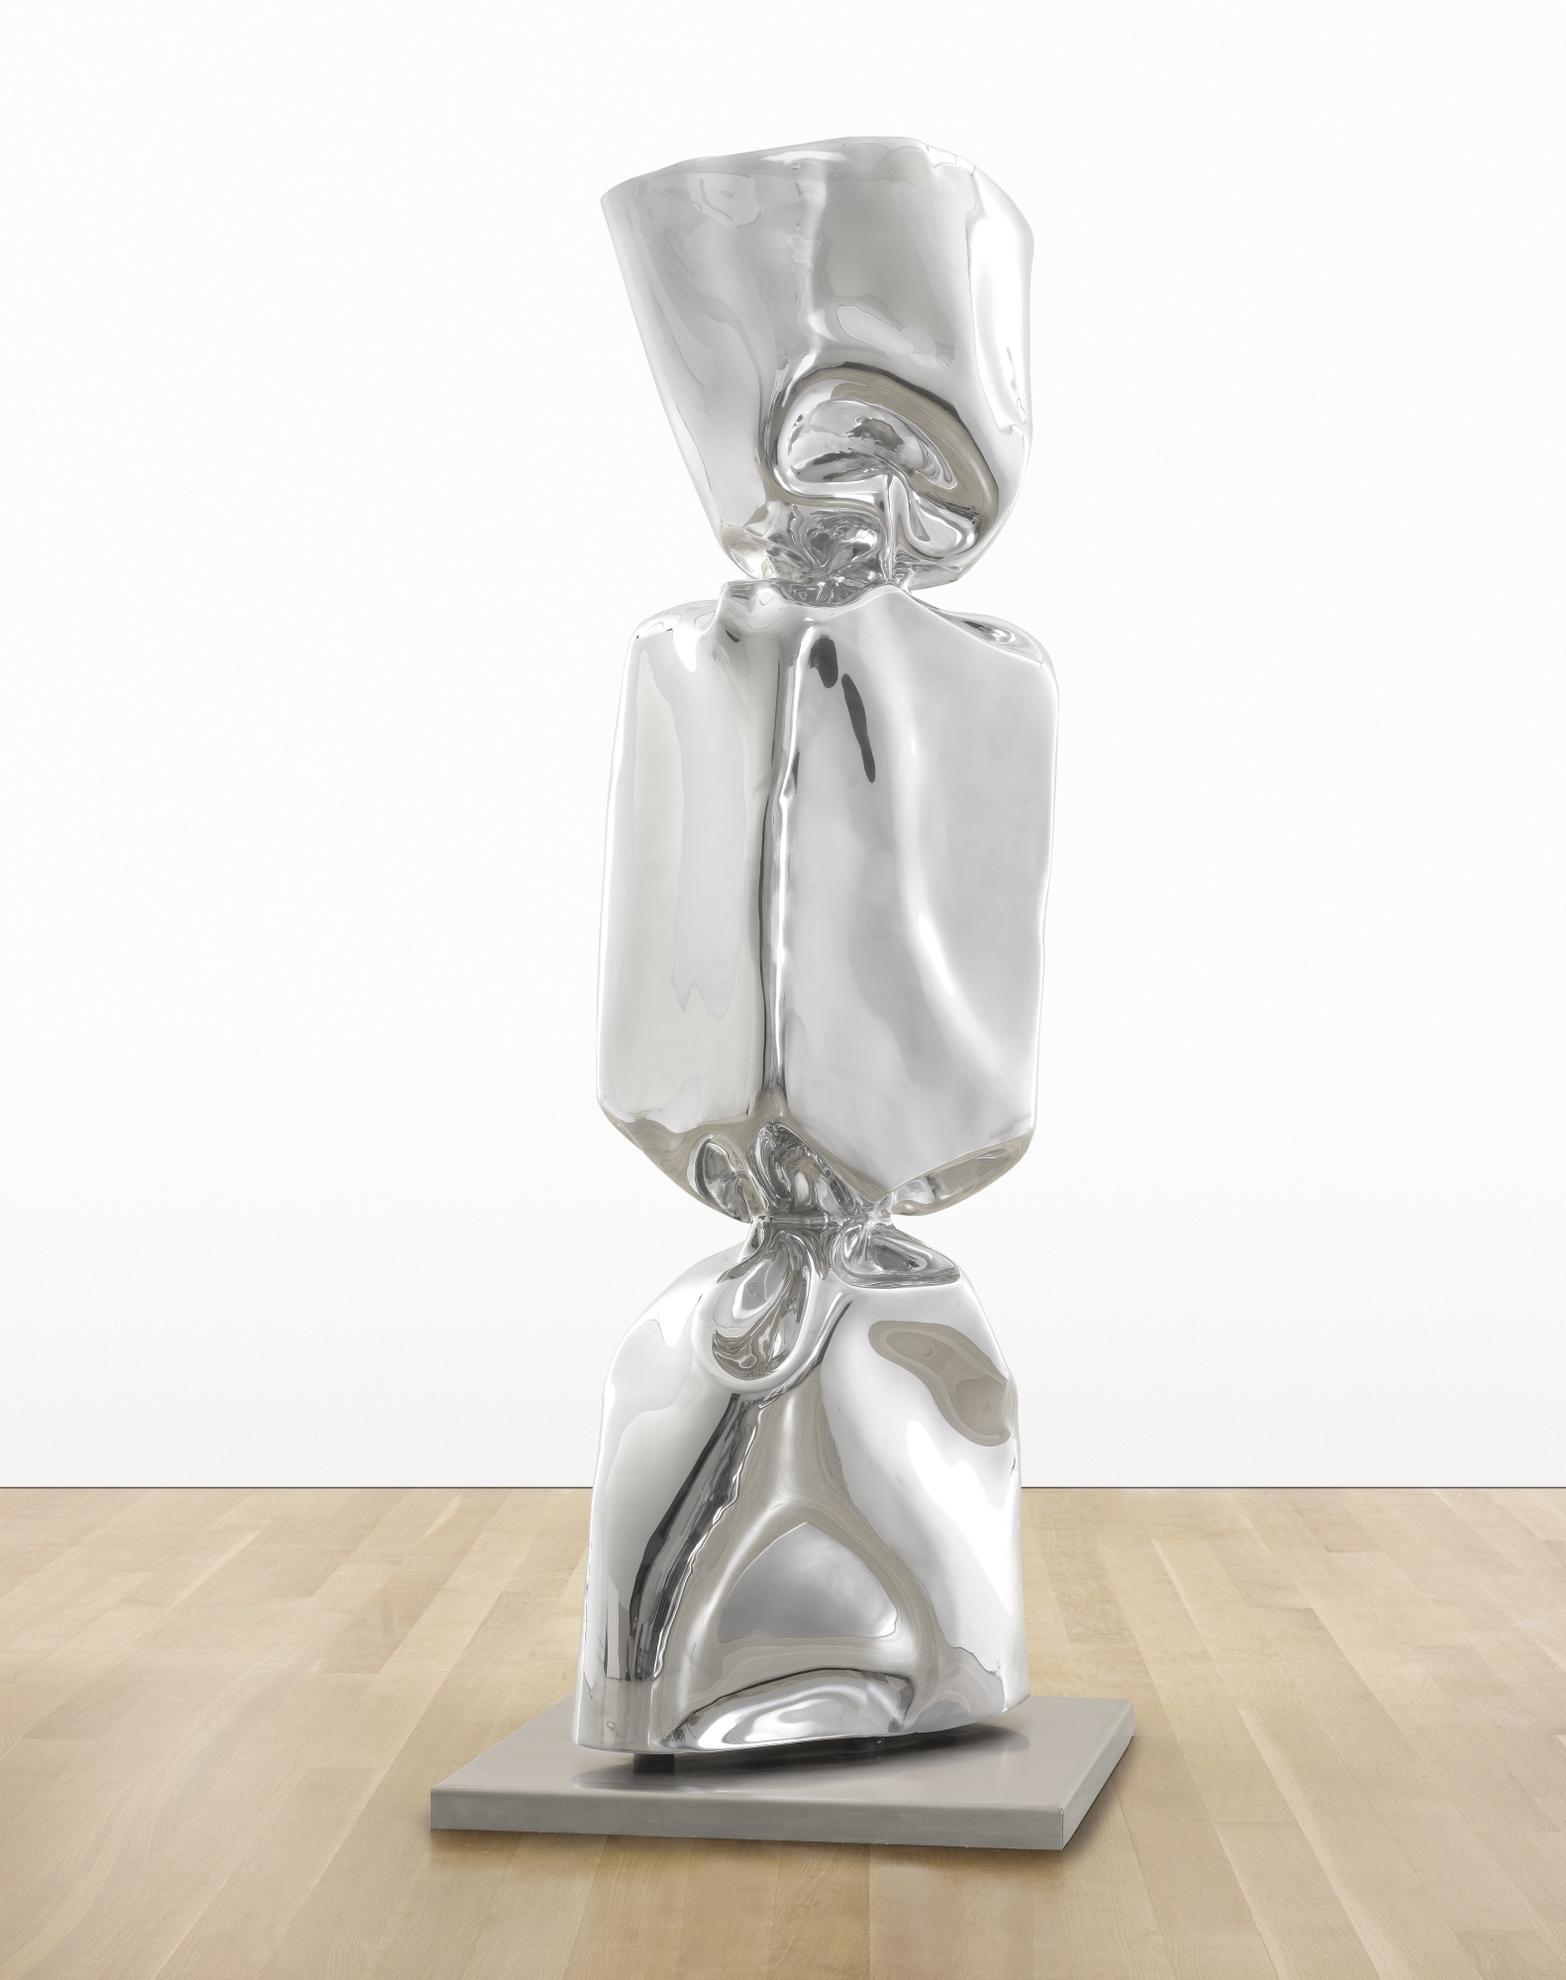 Laurence Jenkell-Bonbon Aluminium Polimiroir-2013